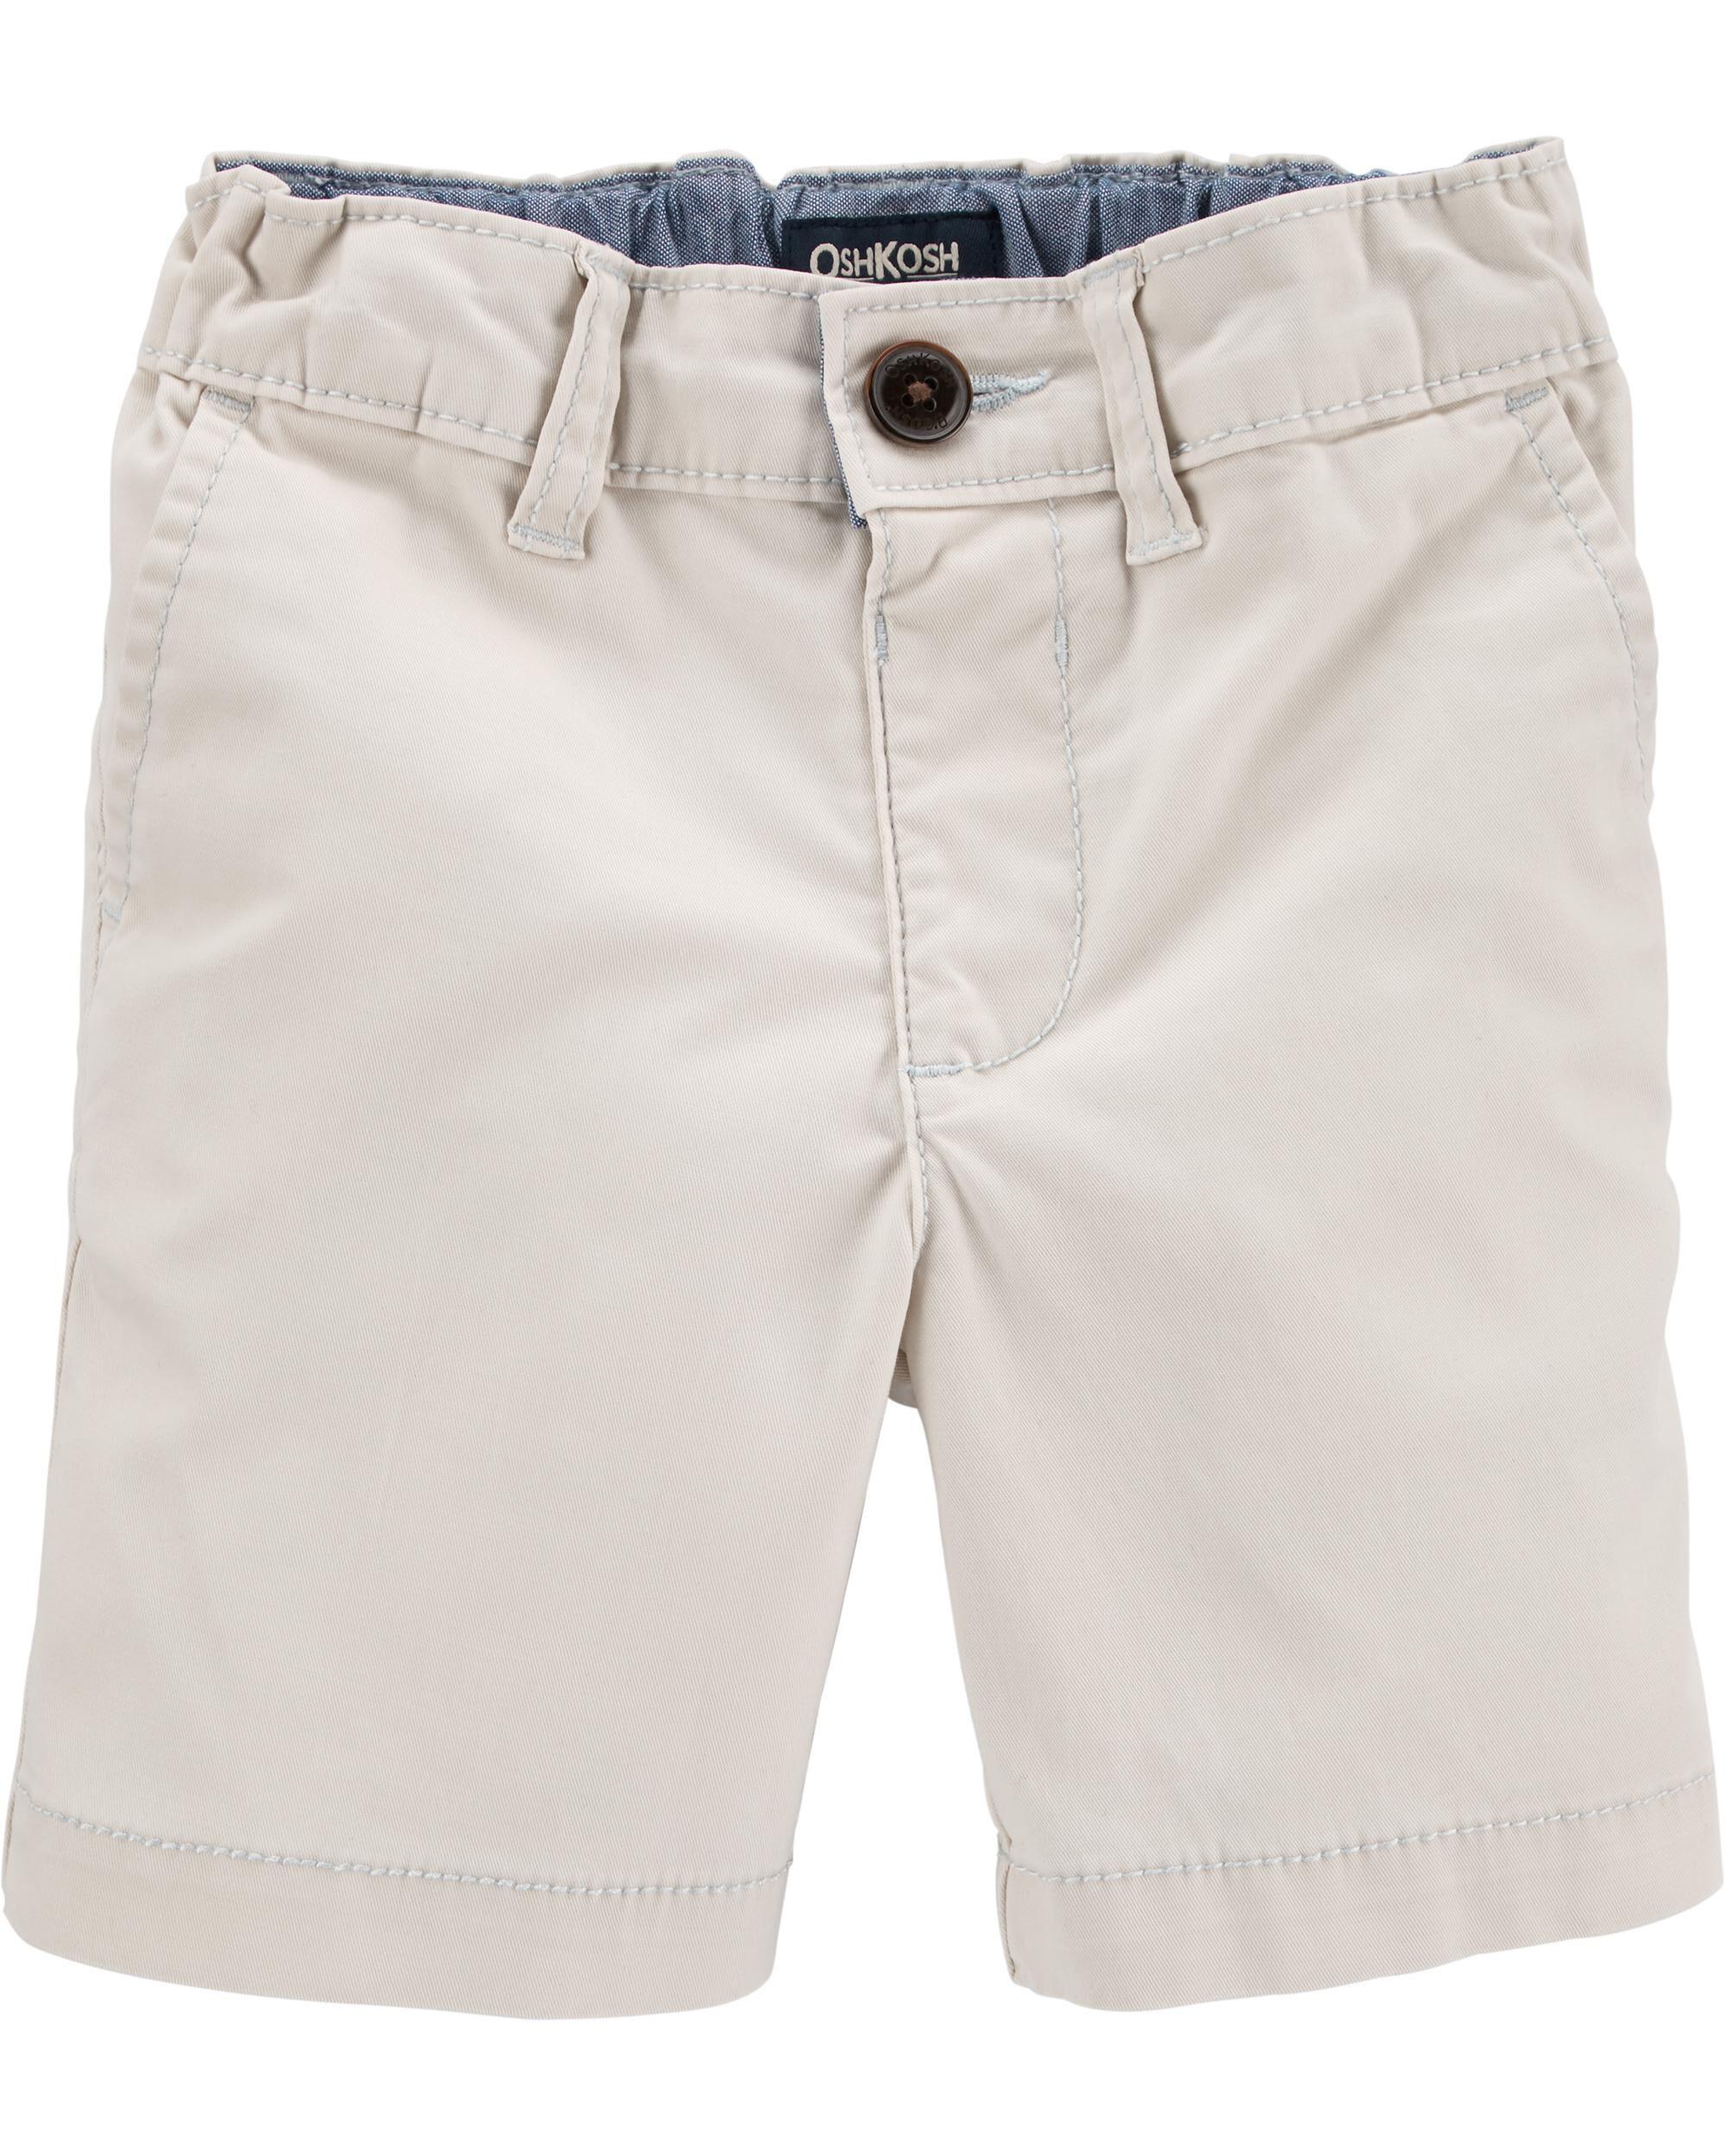 NEXT Gorgeous Little Aqua Chino Shorts with Adjustable waist NWT